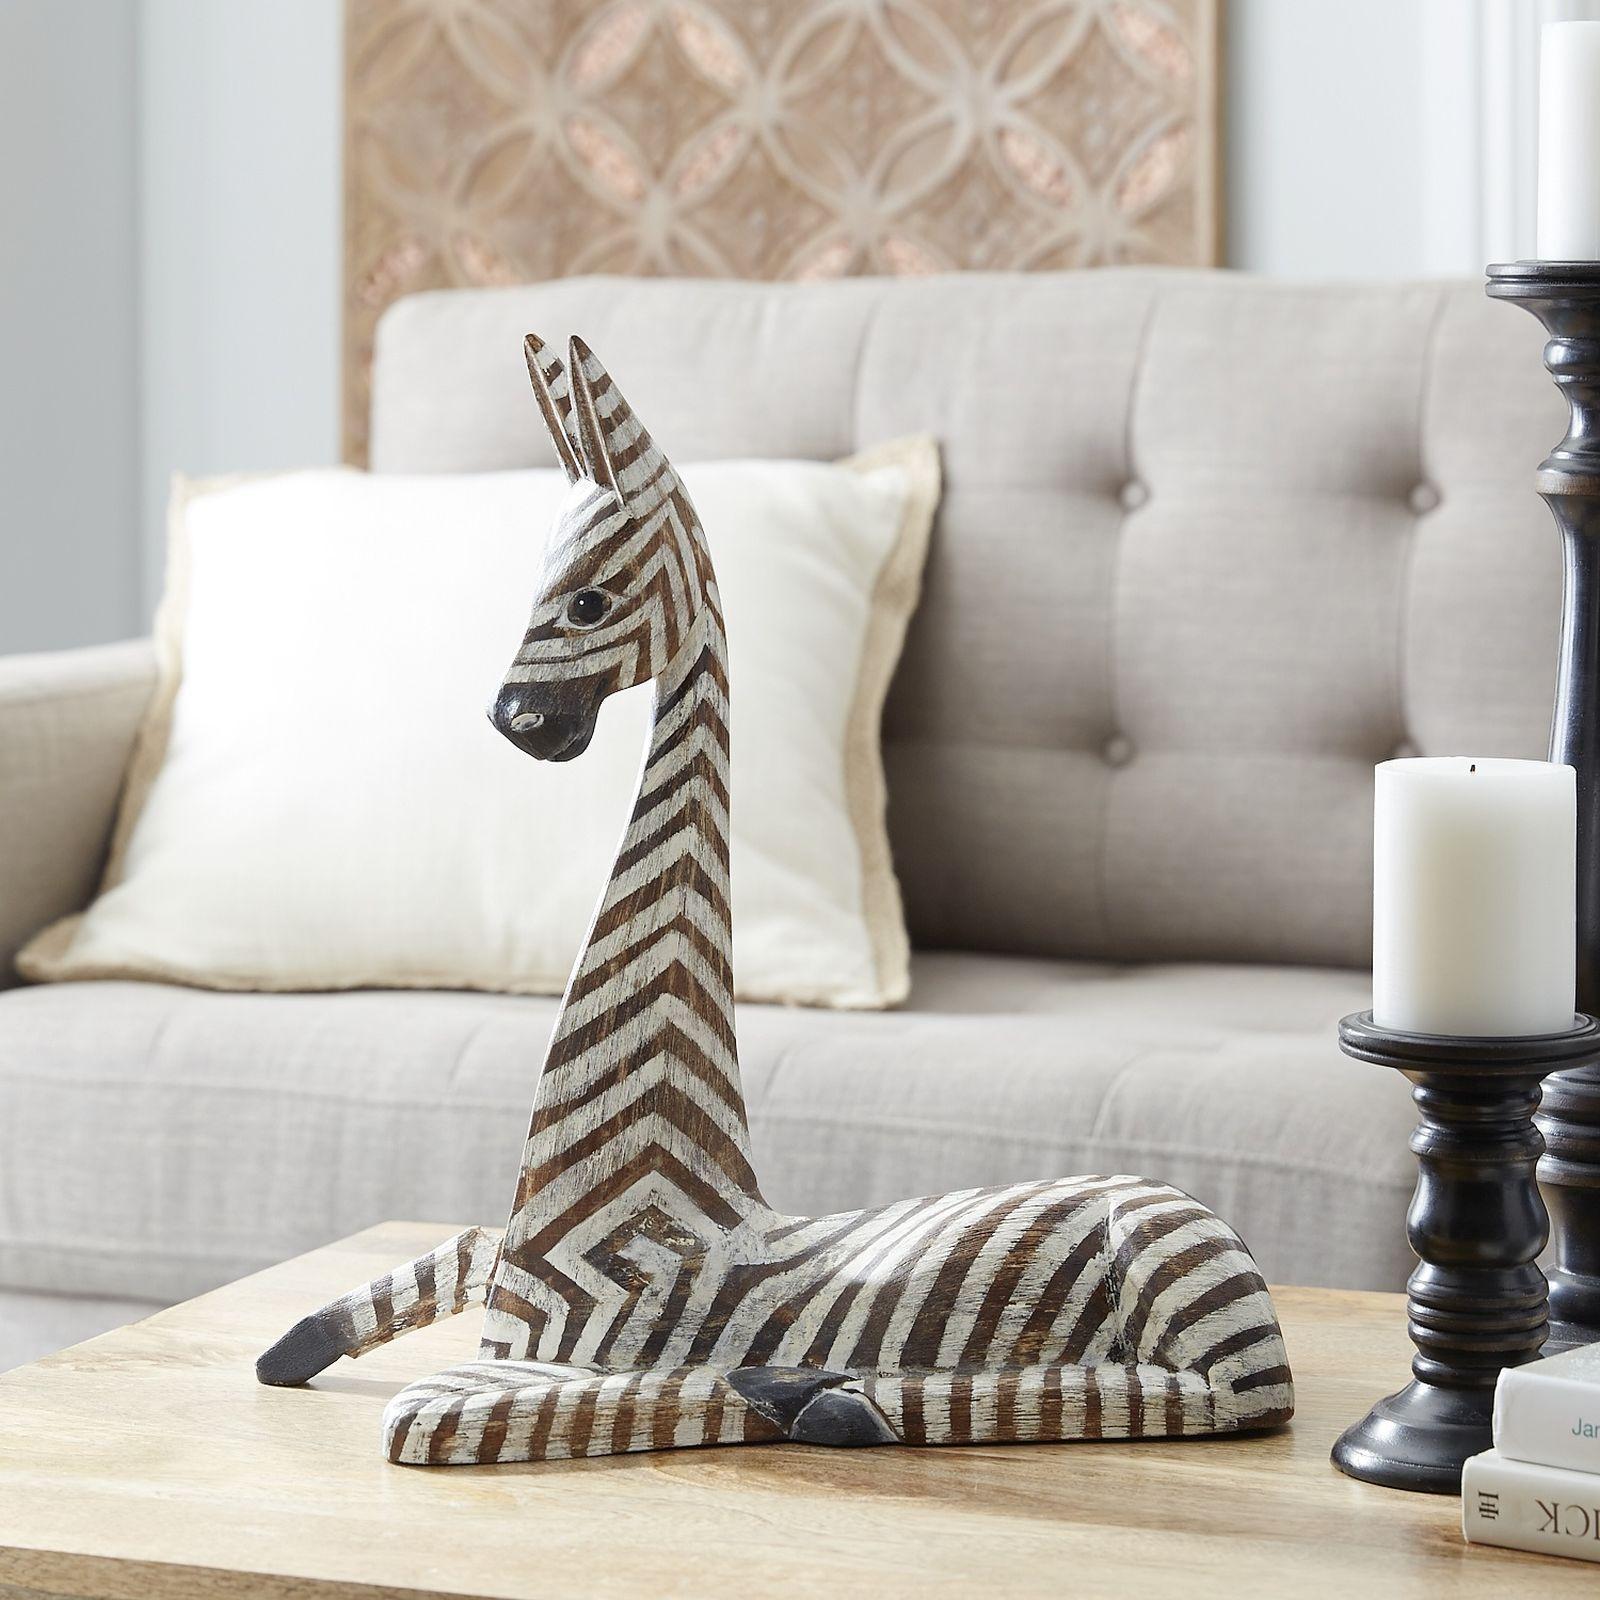 Wooden Sitting Zebra | Pier 1 Imports | Ideas para decorar ...